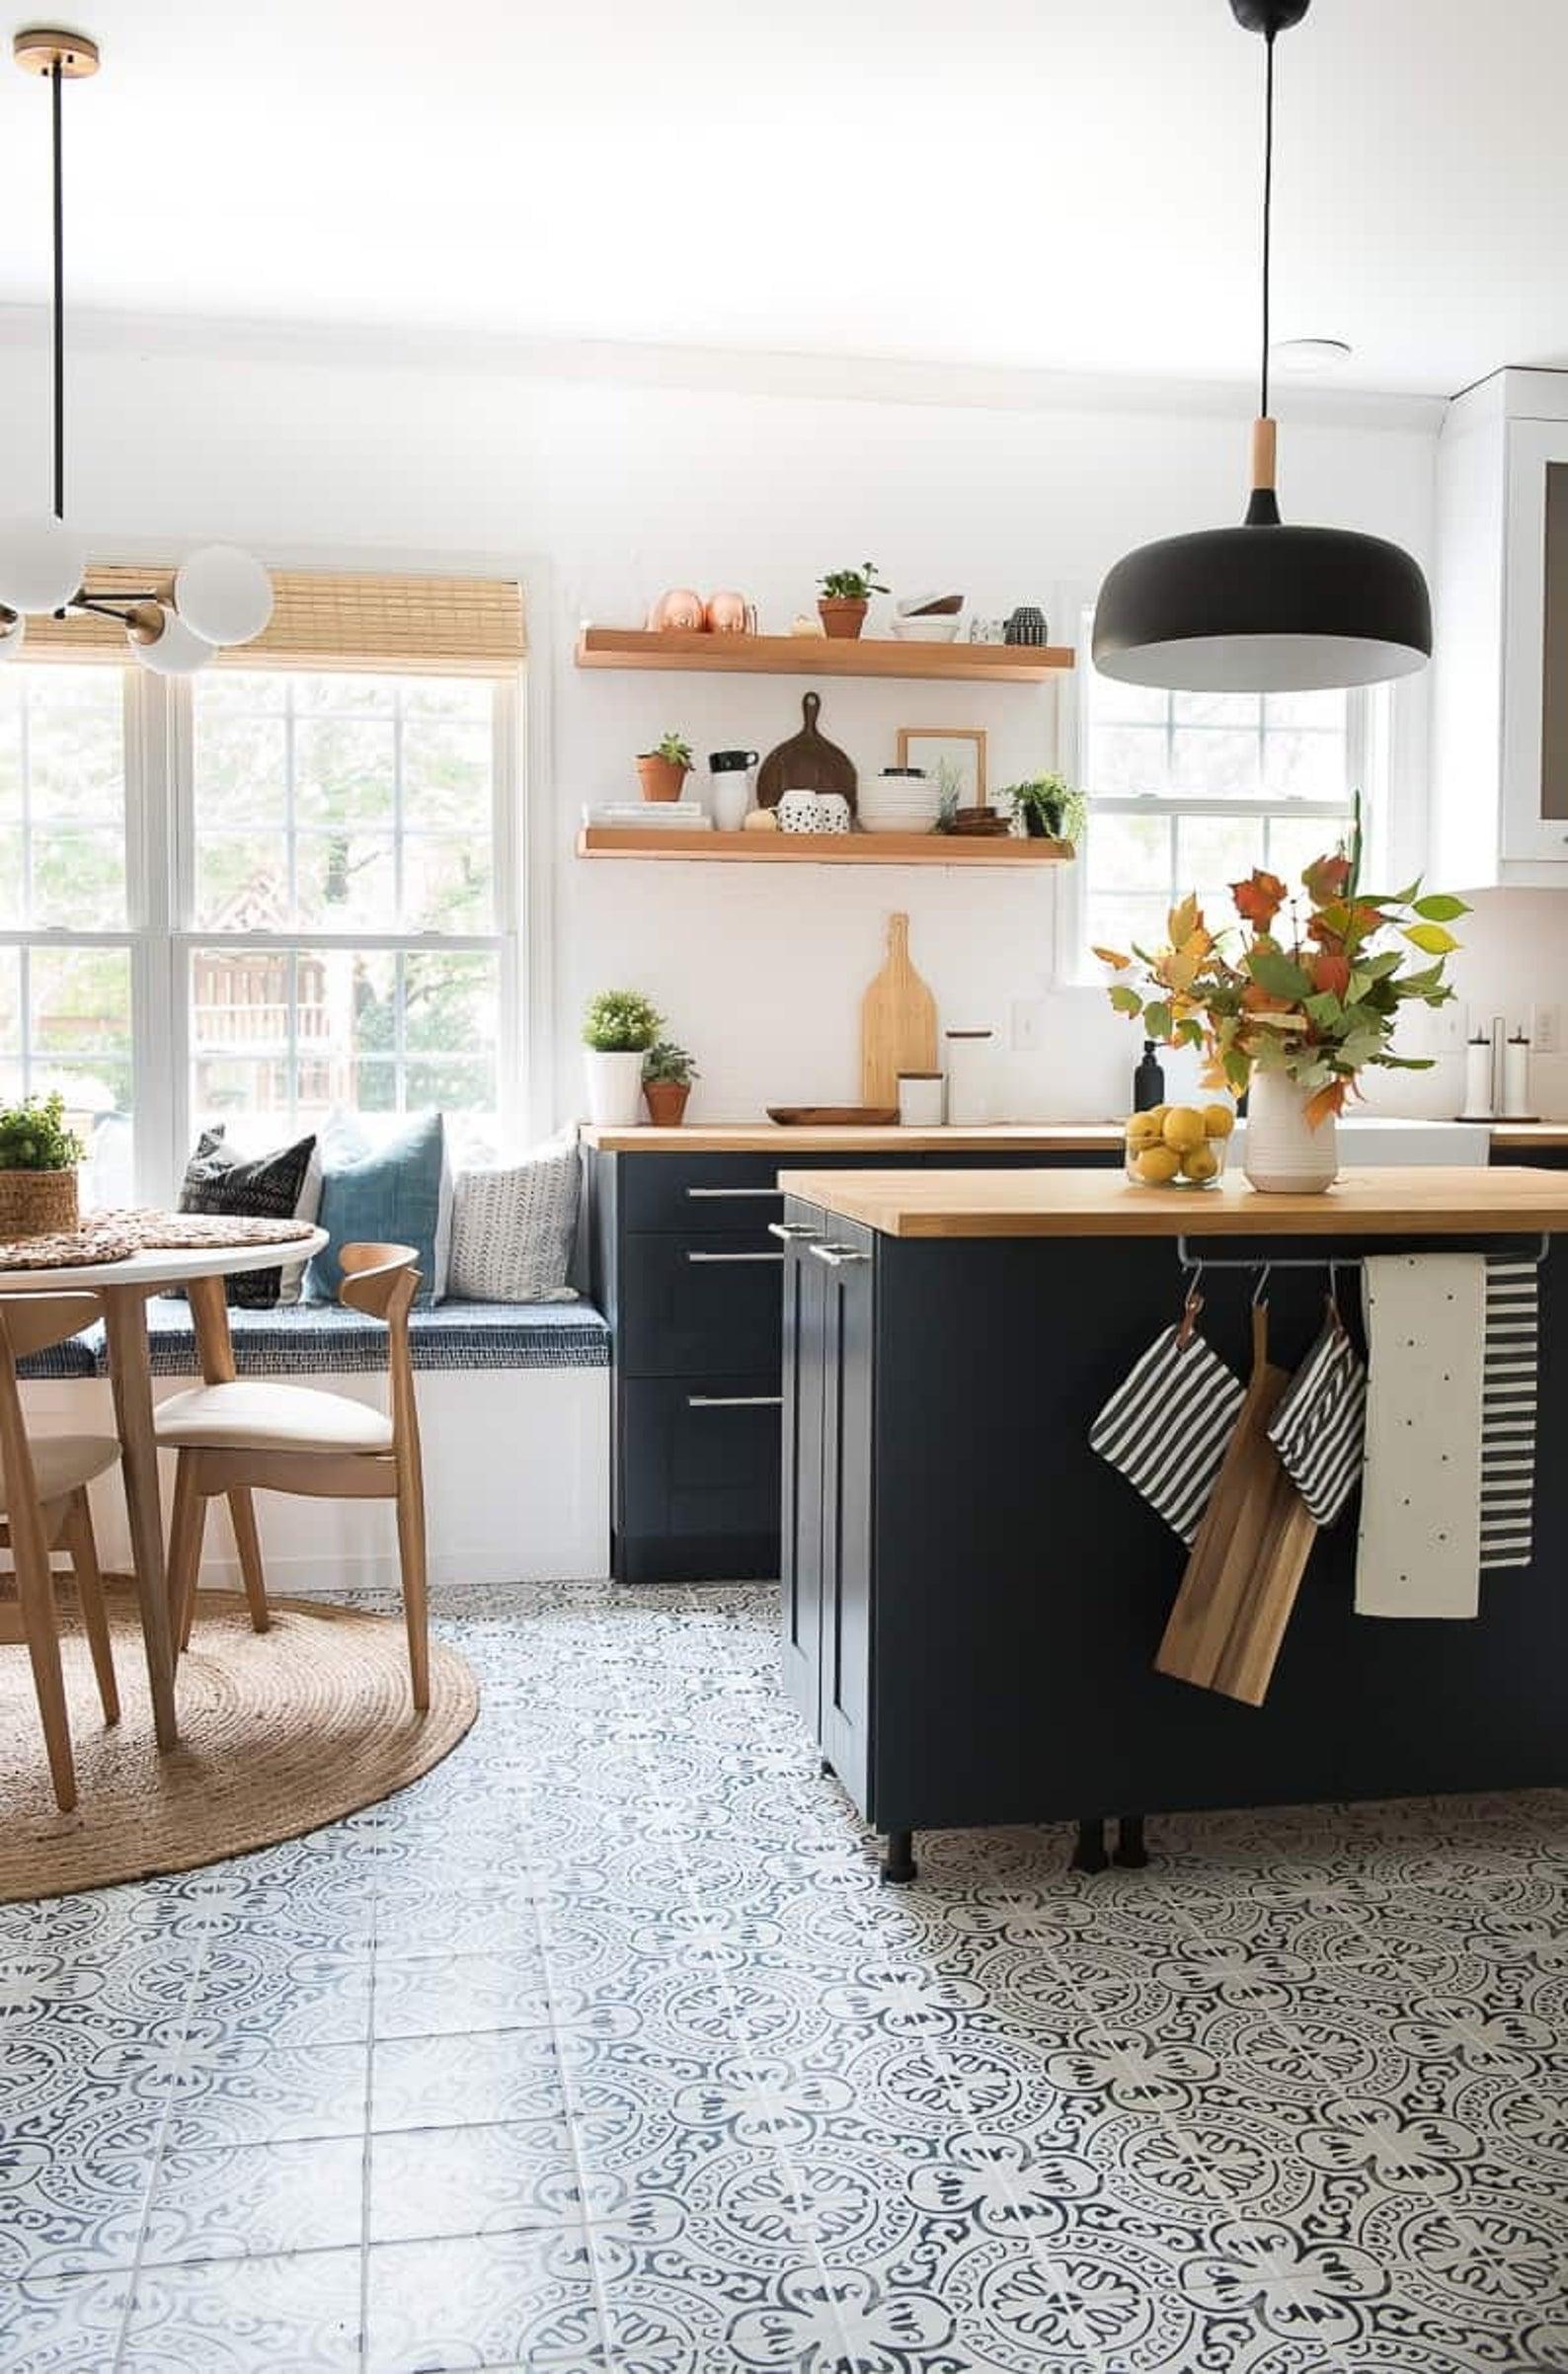 - Upgrade Your Apartment Using Peel And Stick Floor Tiles POPSUGAR